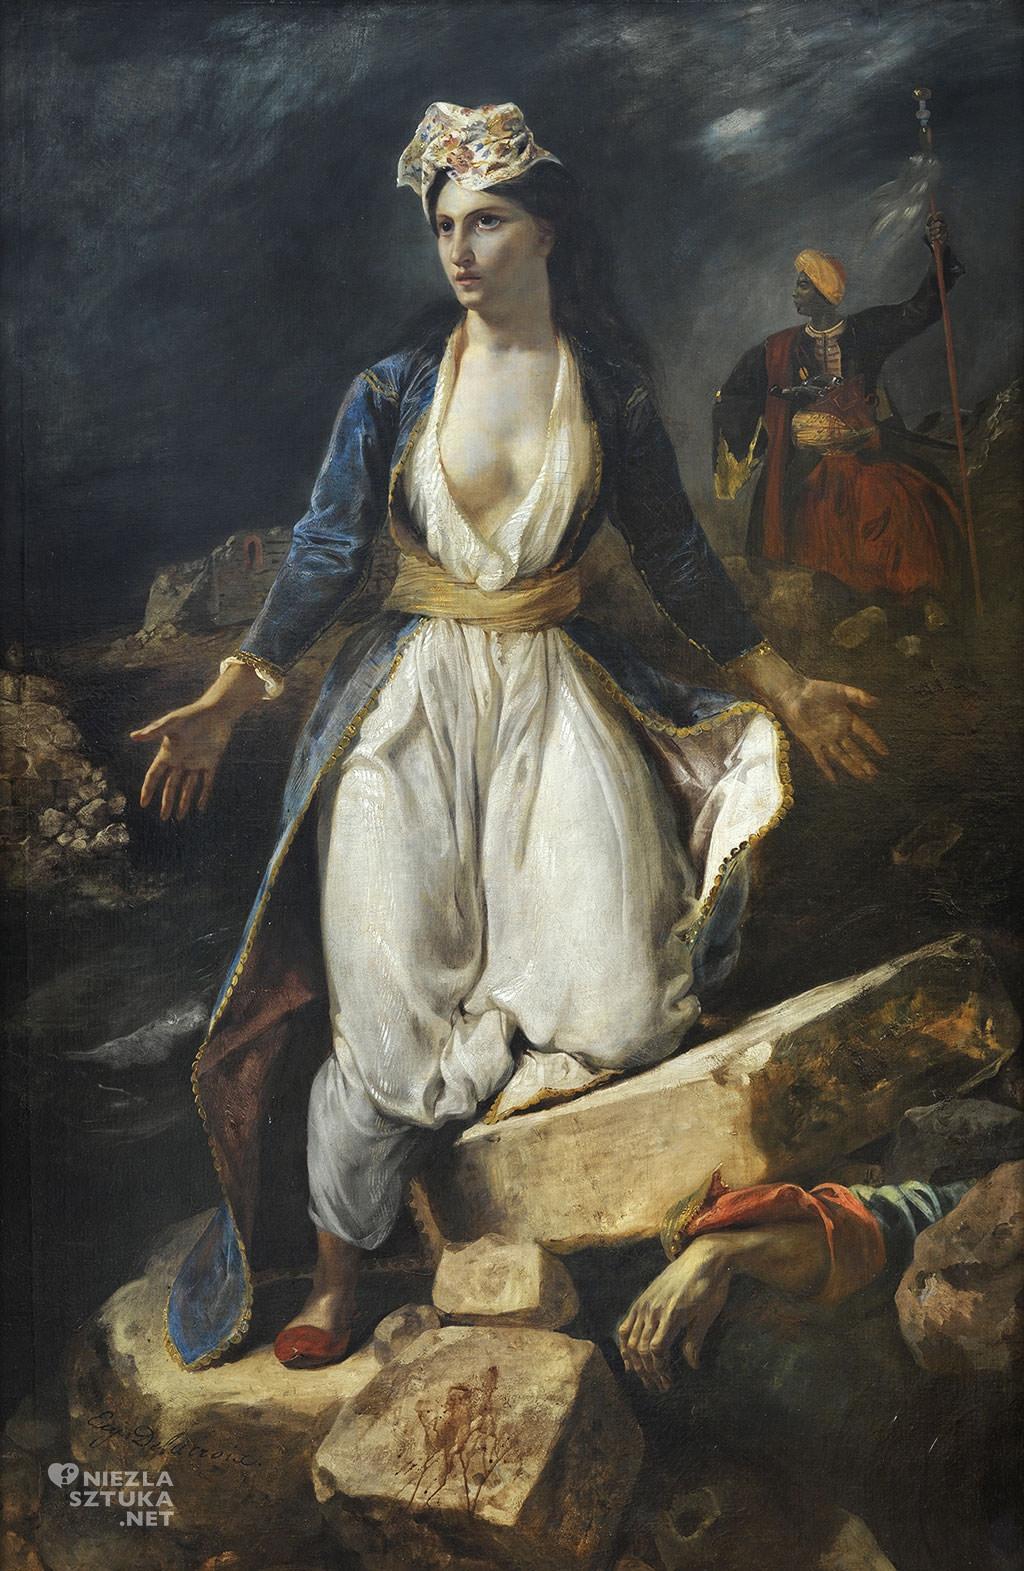 Eugène Delacroix, Grecja na ruinach Missolungi, 1826, Muzeum Sztuk Pieknych w Bordeaux, Niezła sztuka